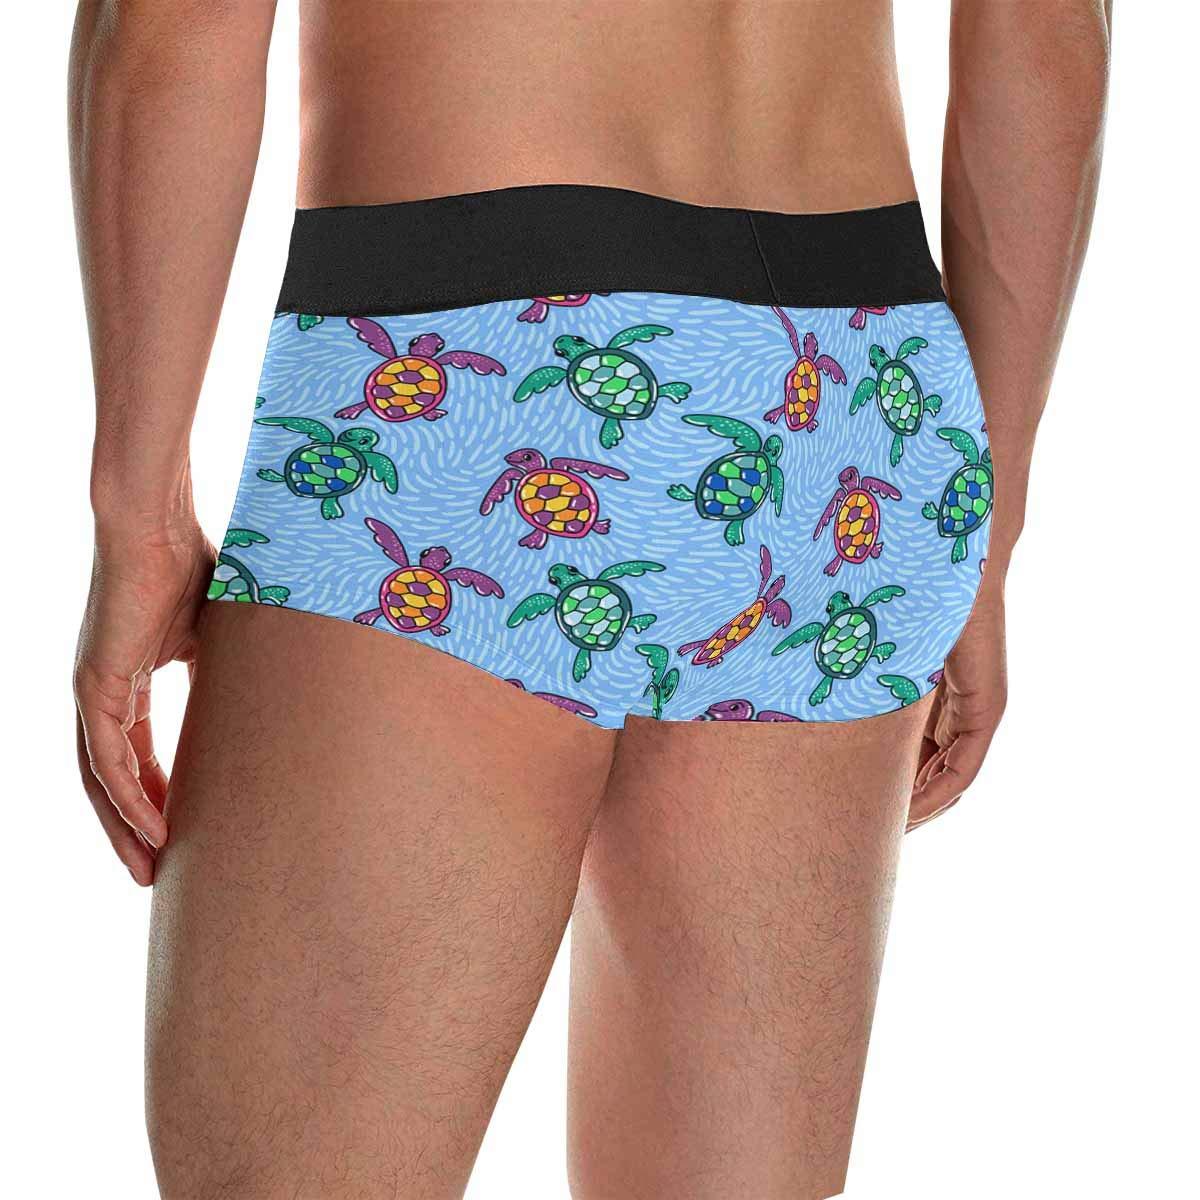 XS-4XL INTERESTPRINT Mens Short Underwear Pants